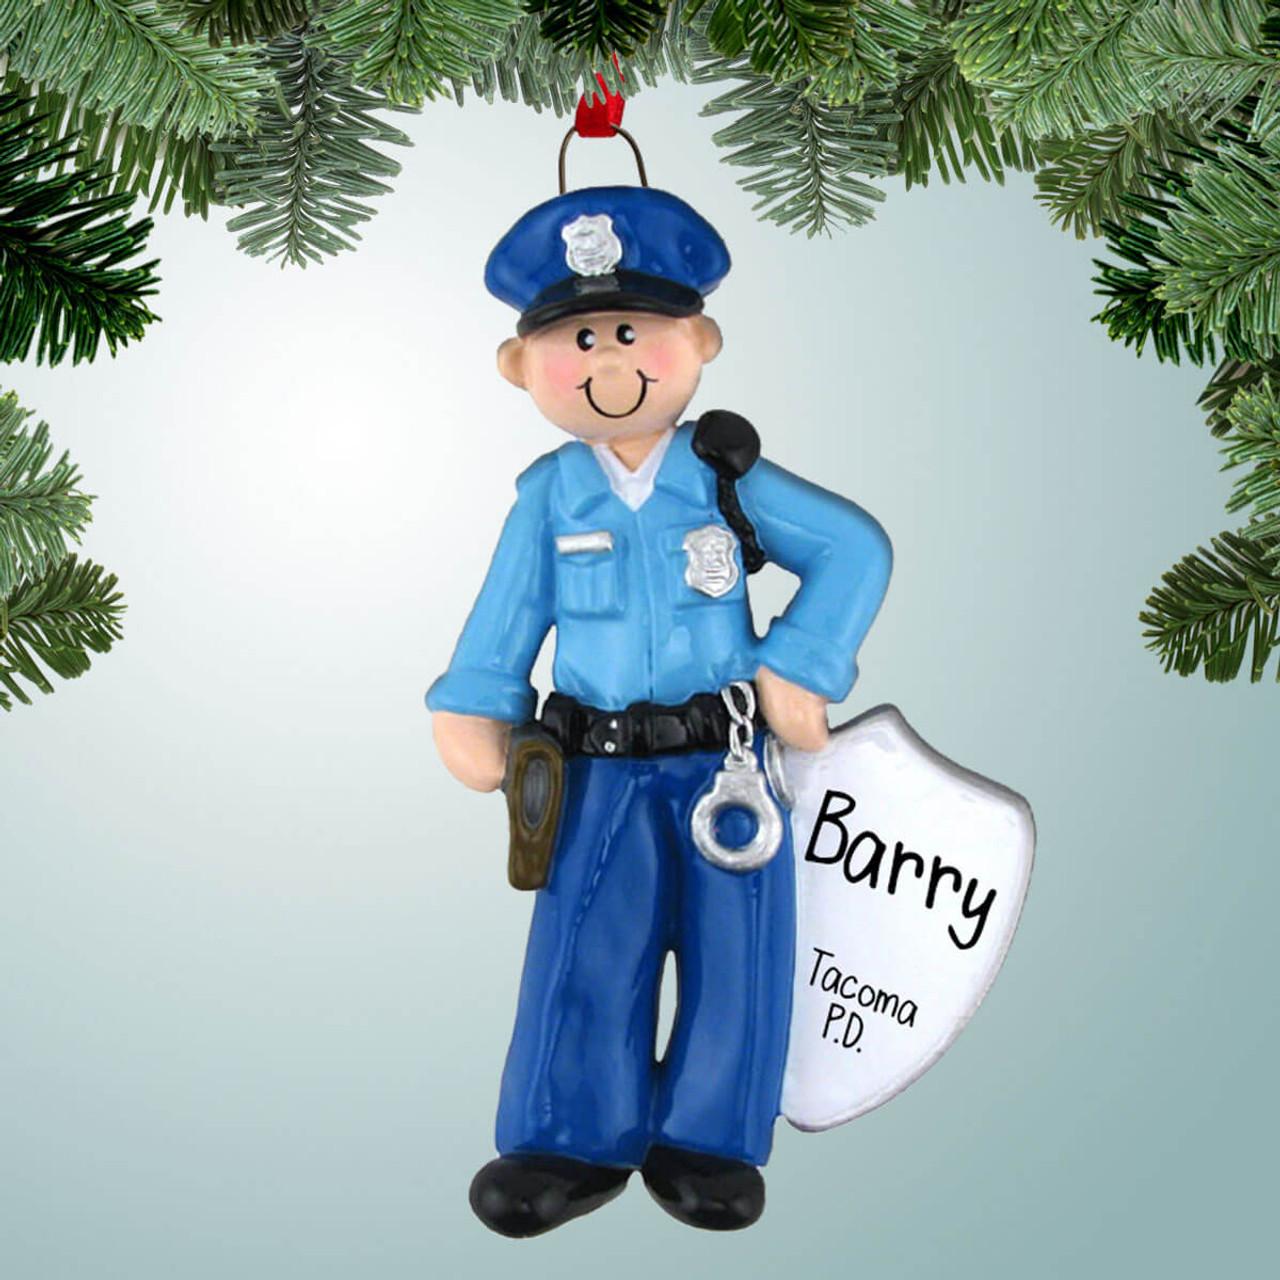 Police Christmas Ornaments.Policeman With Badge